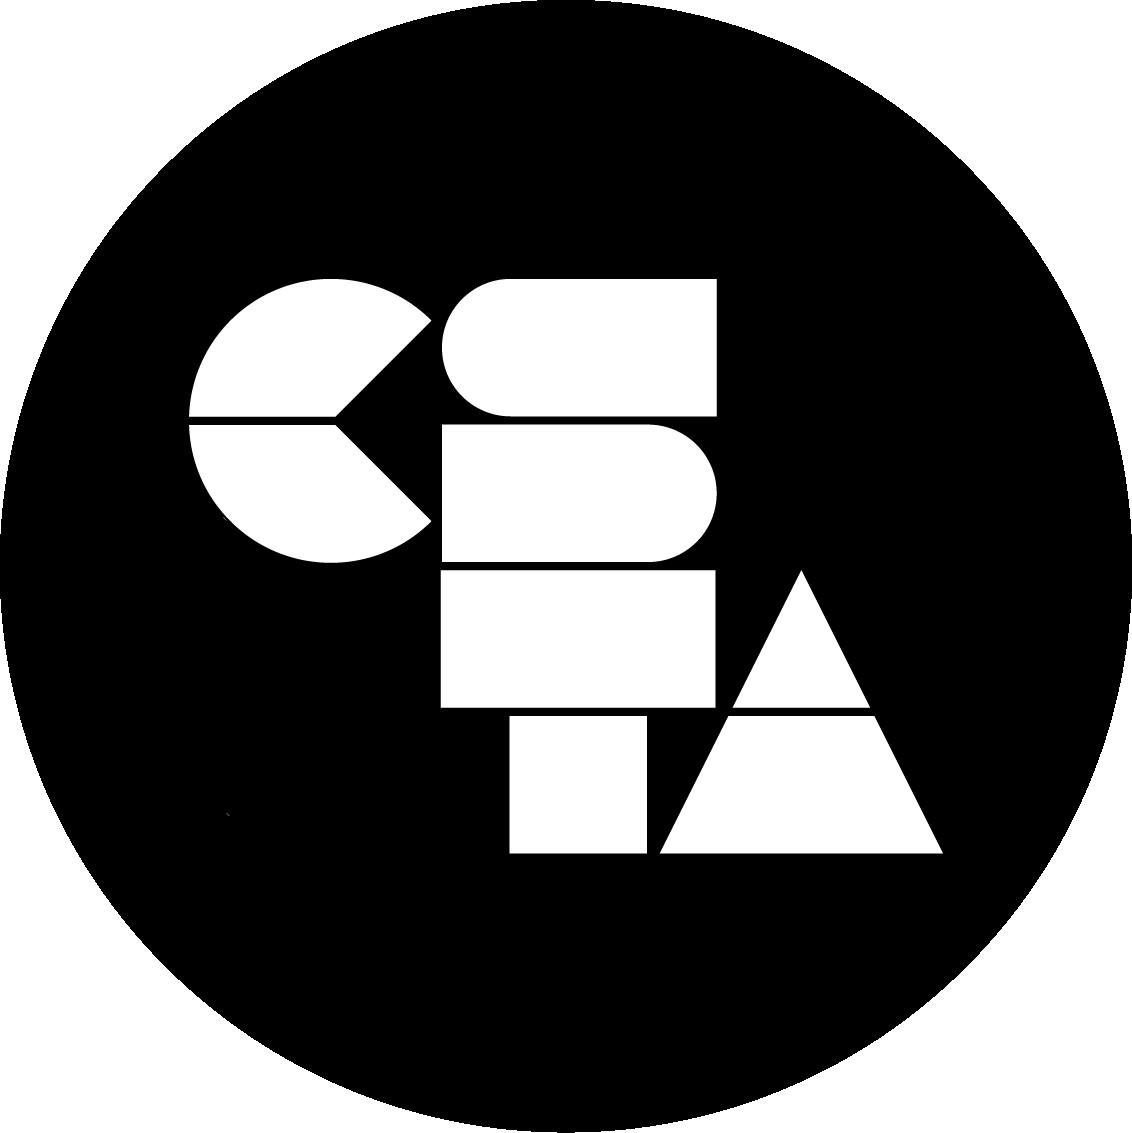 CSTA Greater Boston (CSTA Greater Boston (MA))